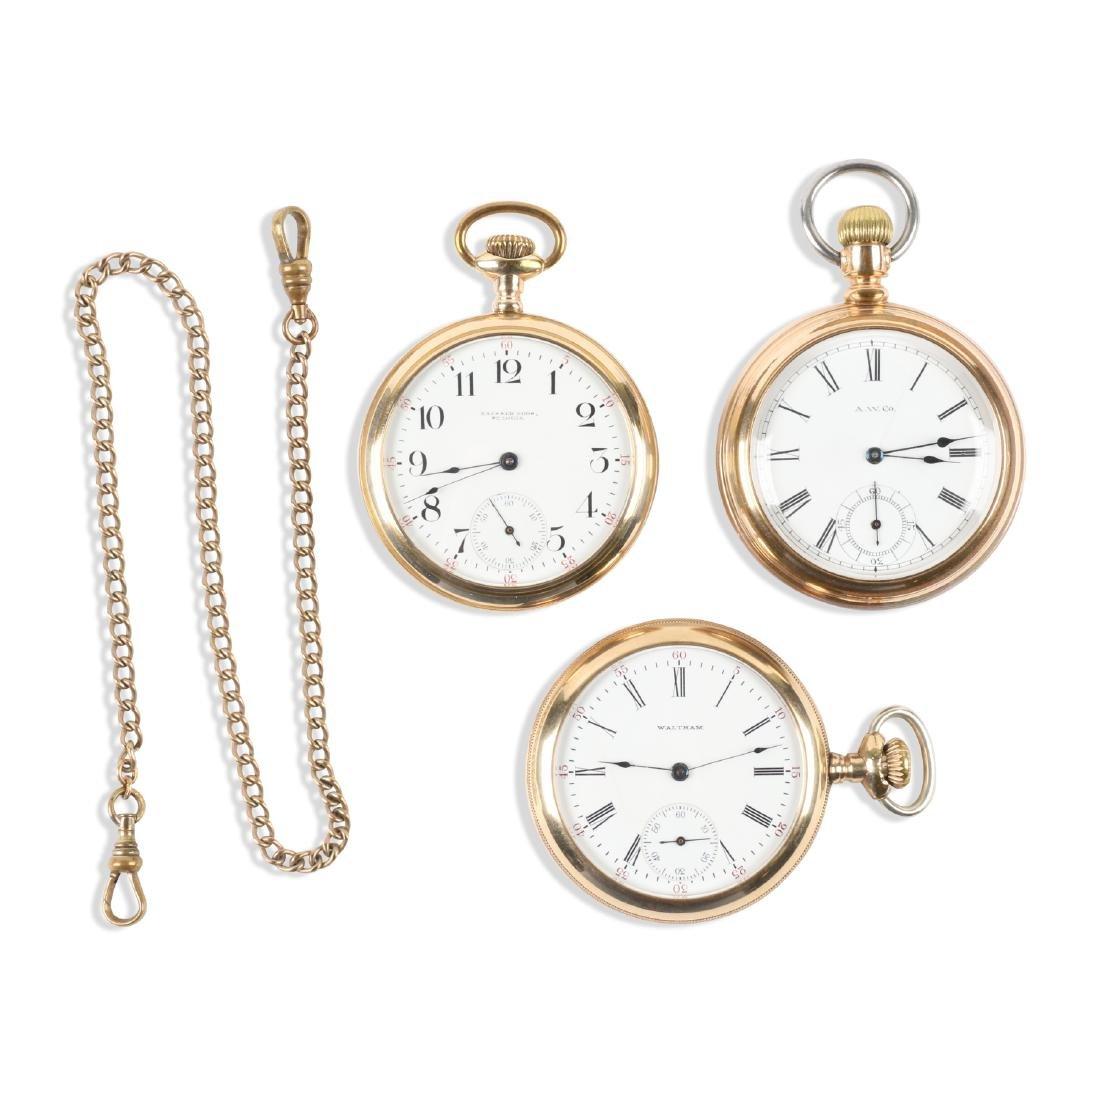 Waltham, 1892 Model & Bond Street Pocket Watches